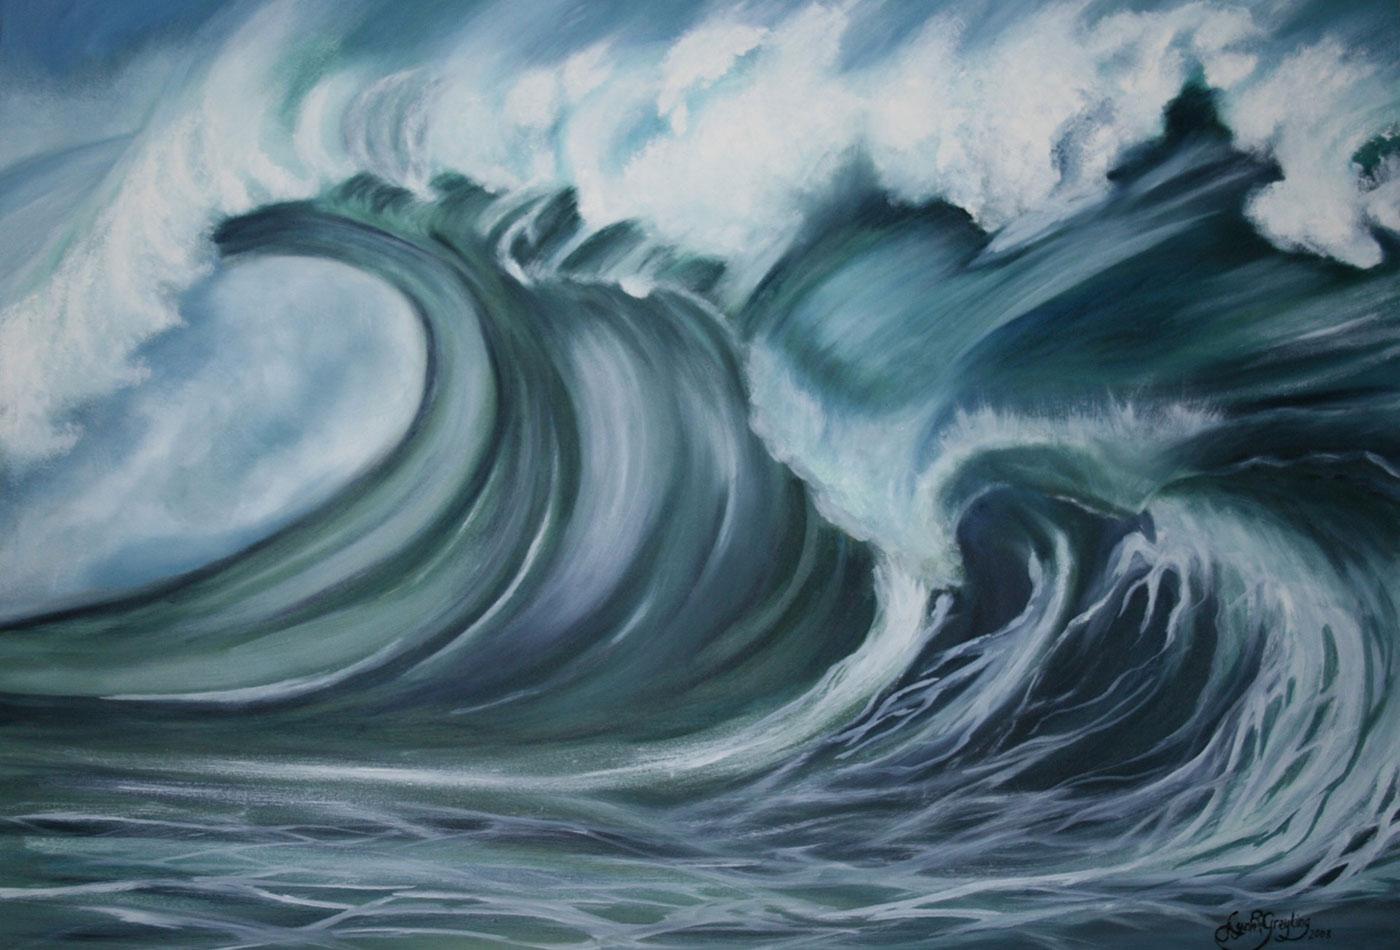 Powerful wave.